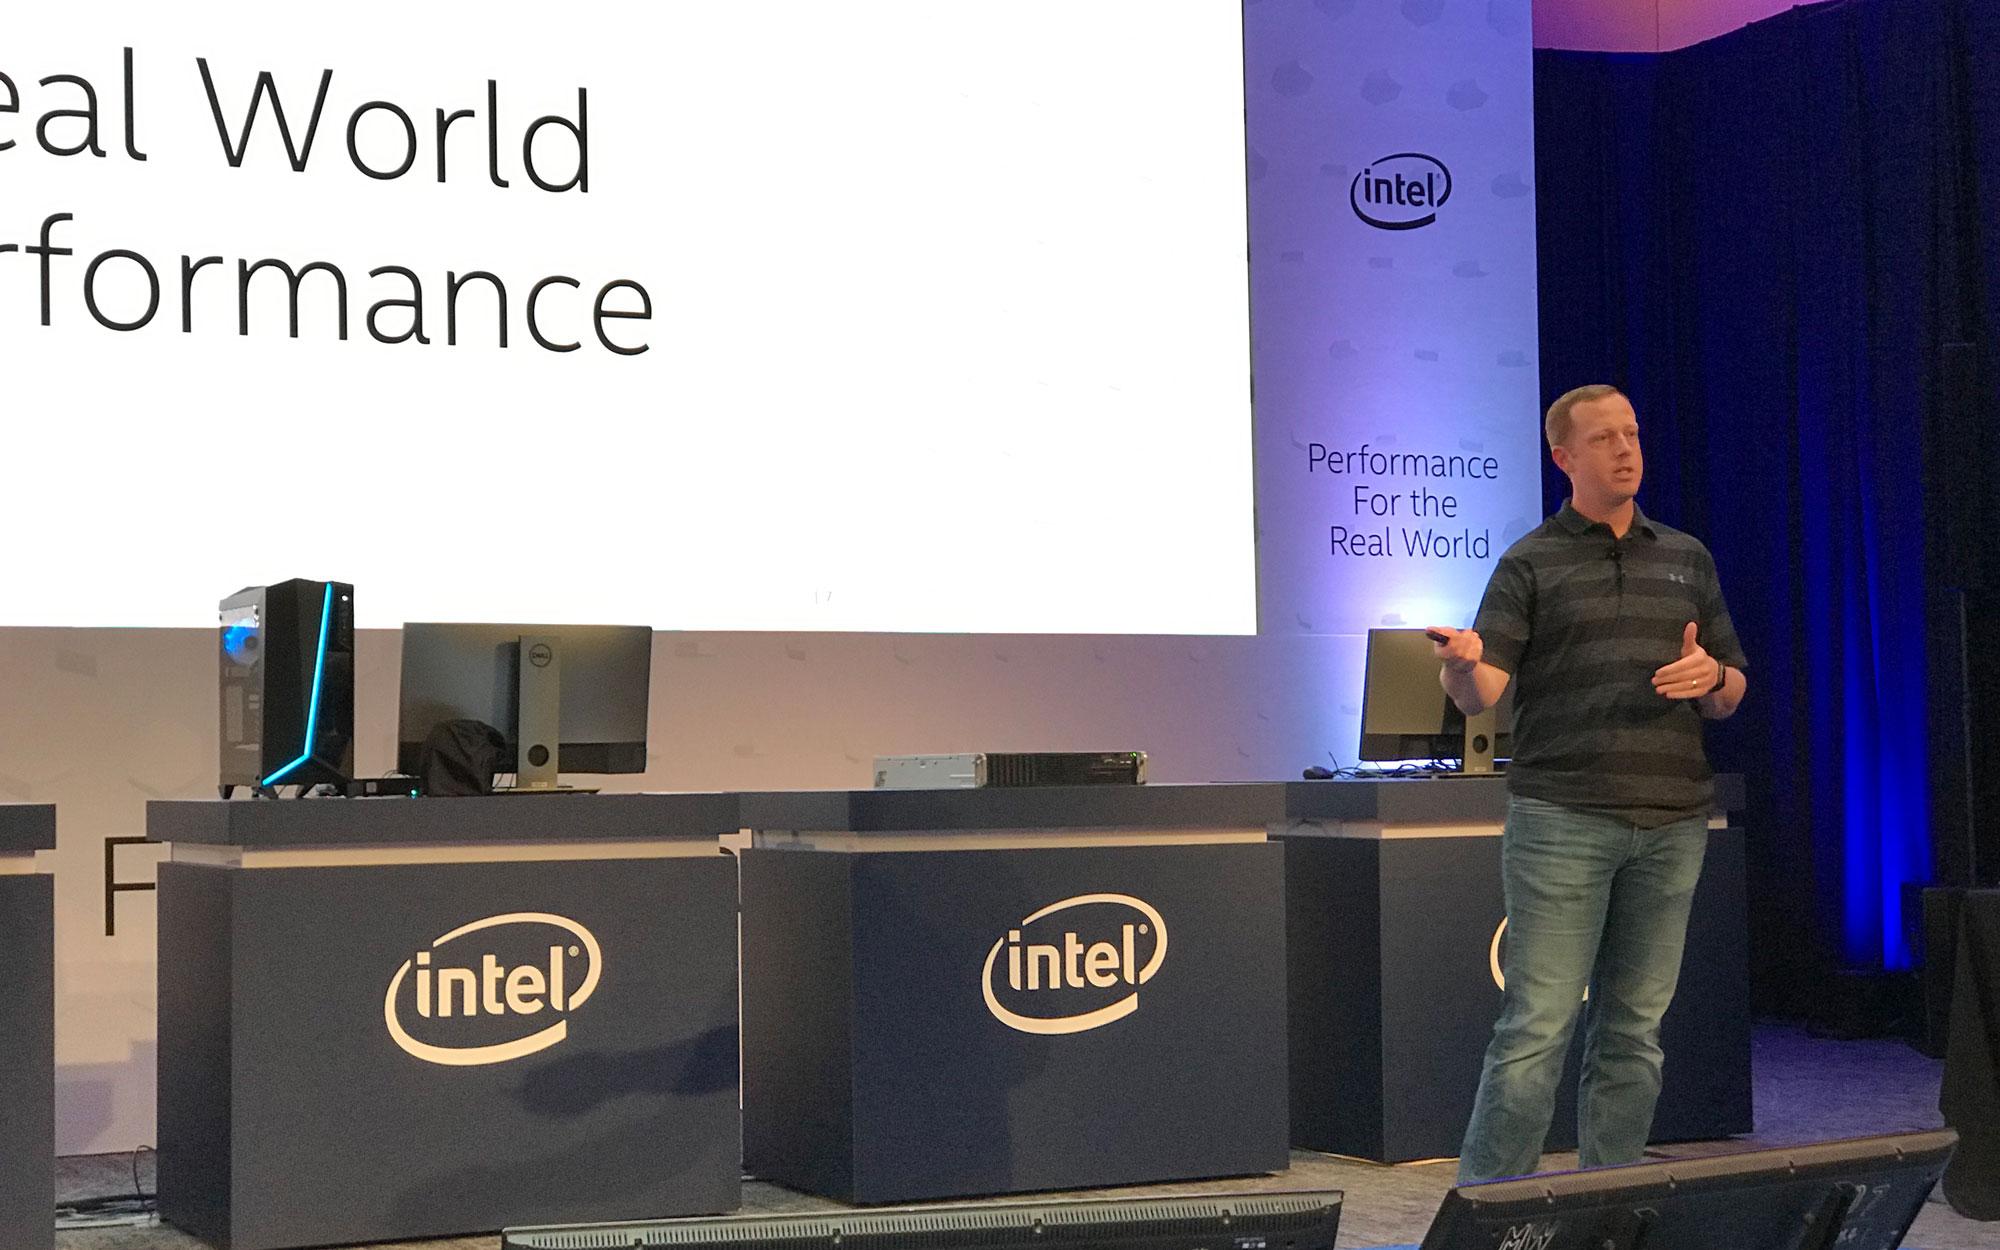 Intel Discusses Real World Performance Focus, Teases Gen11 Graphics & i9-9900KS - Processors  1